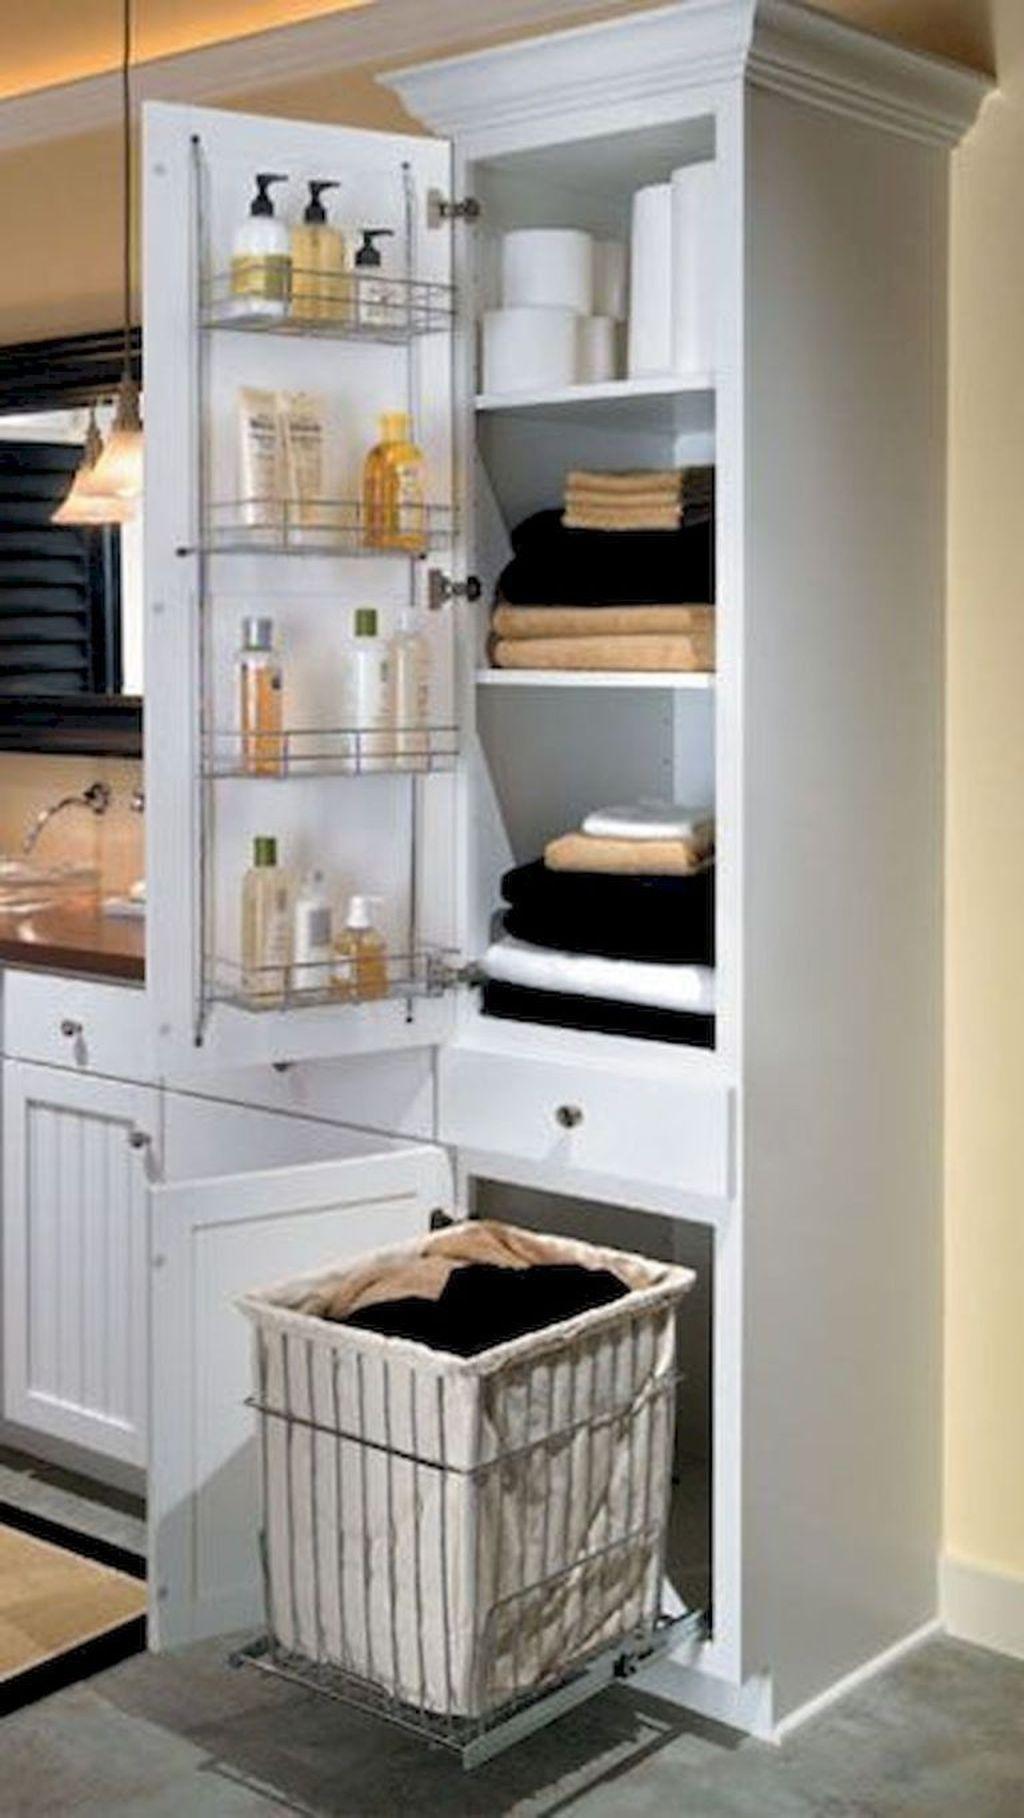 44 Lovely Small Master Bathroom Remodel Ideas